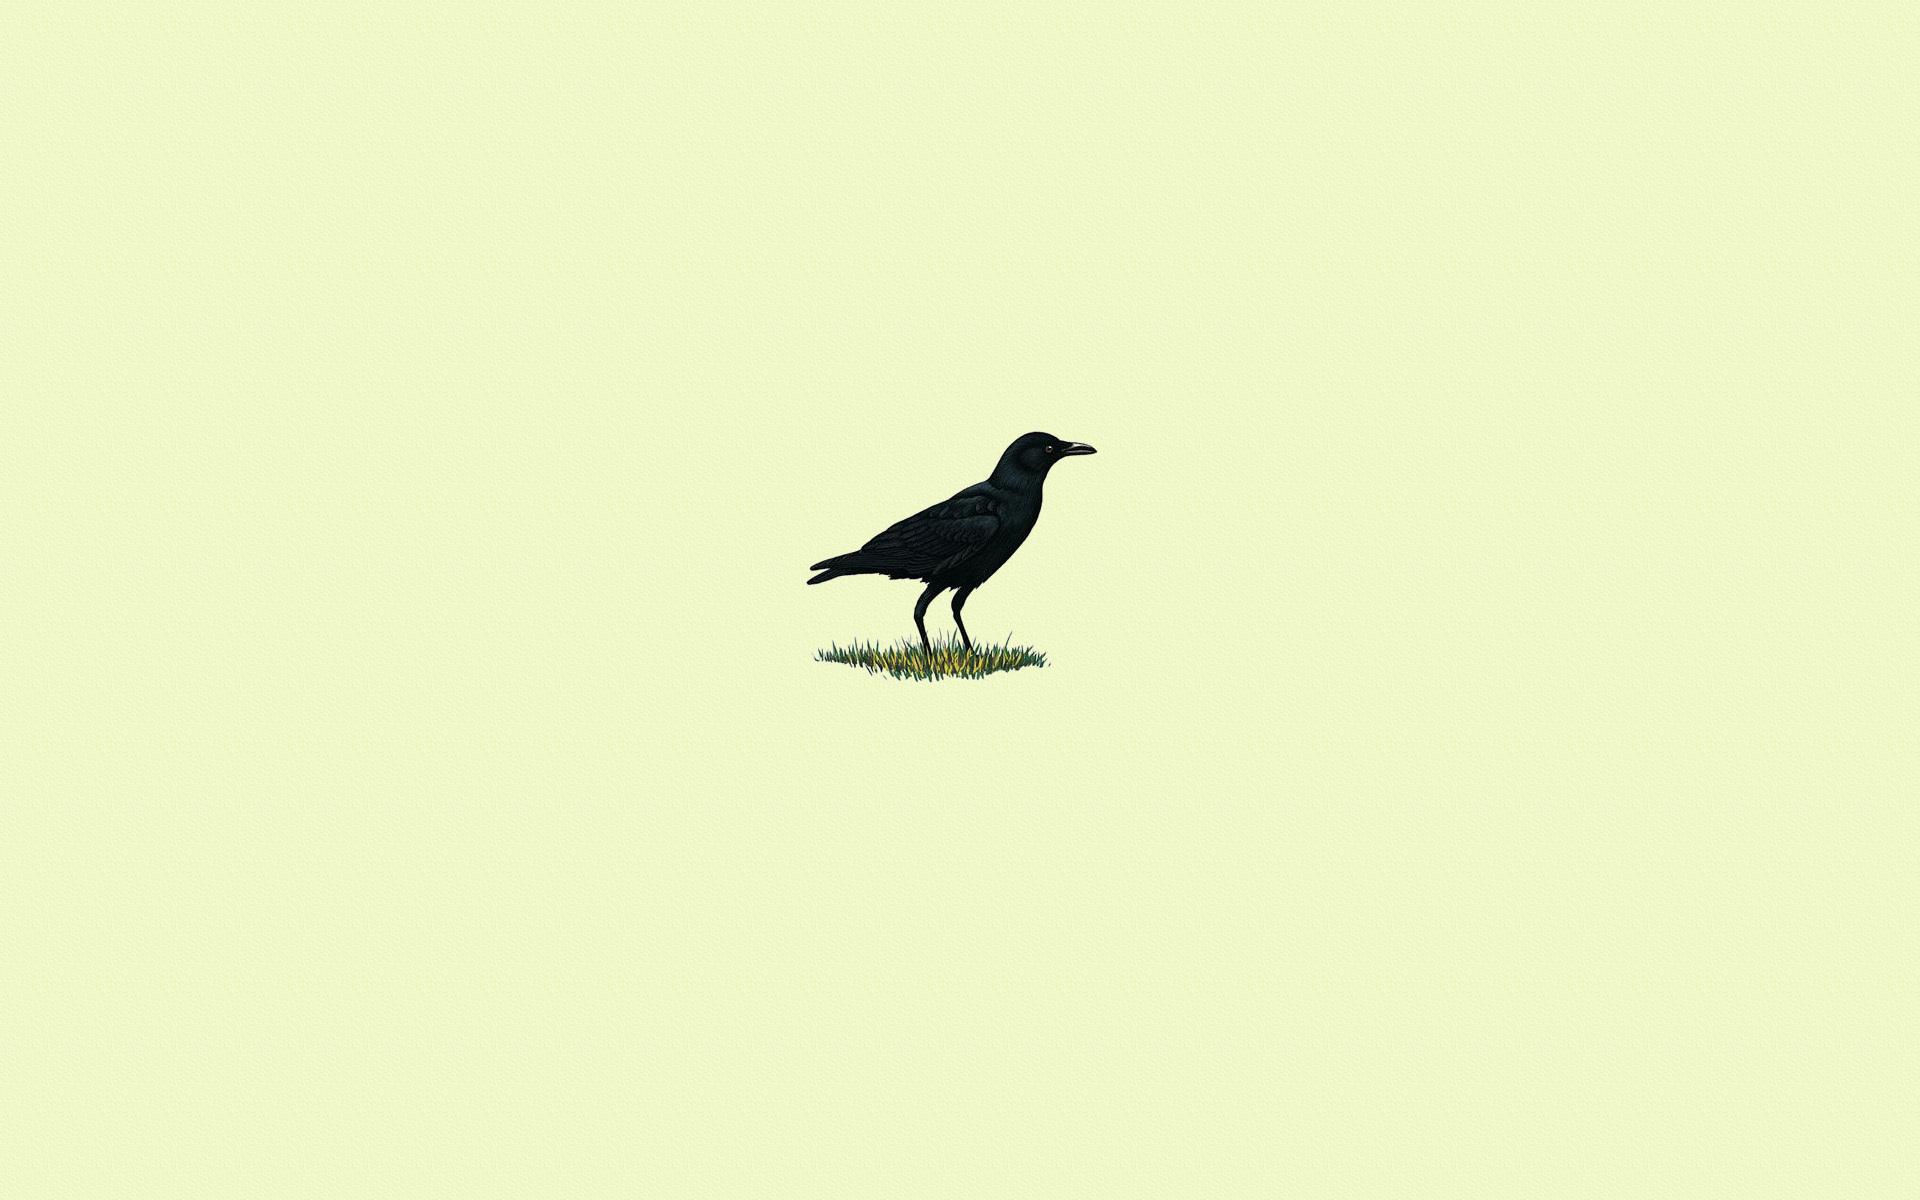 Amazing Wallpaper Bird Minimalist - voron-trava-ptica-chernyy  Graphic_737044.jpg